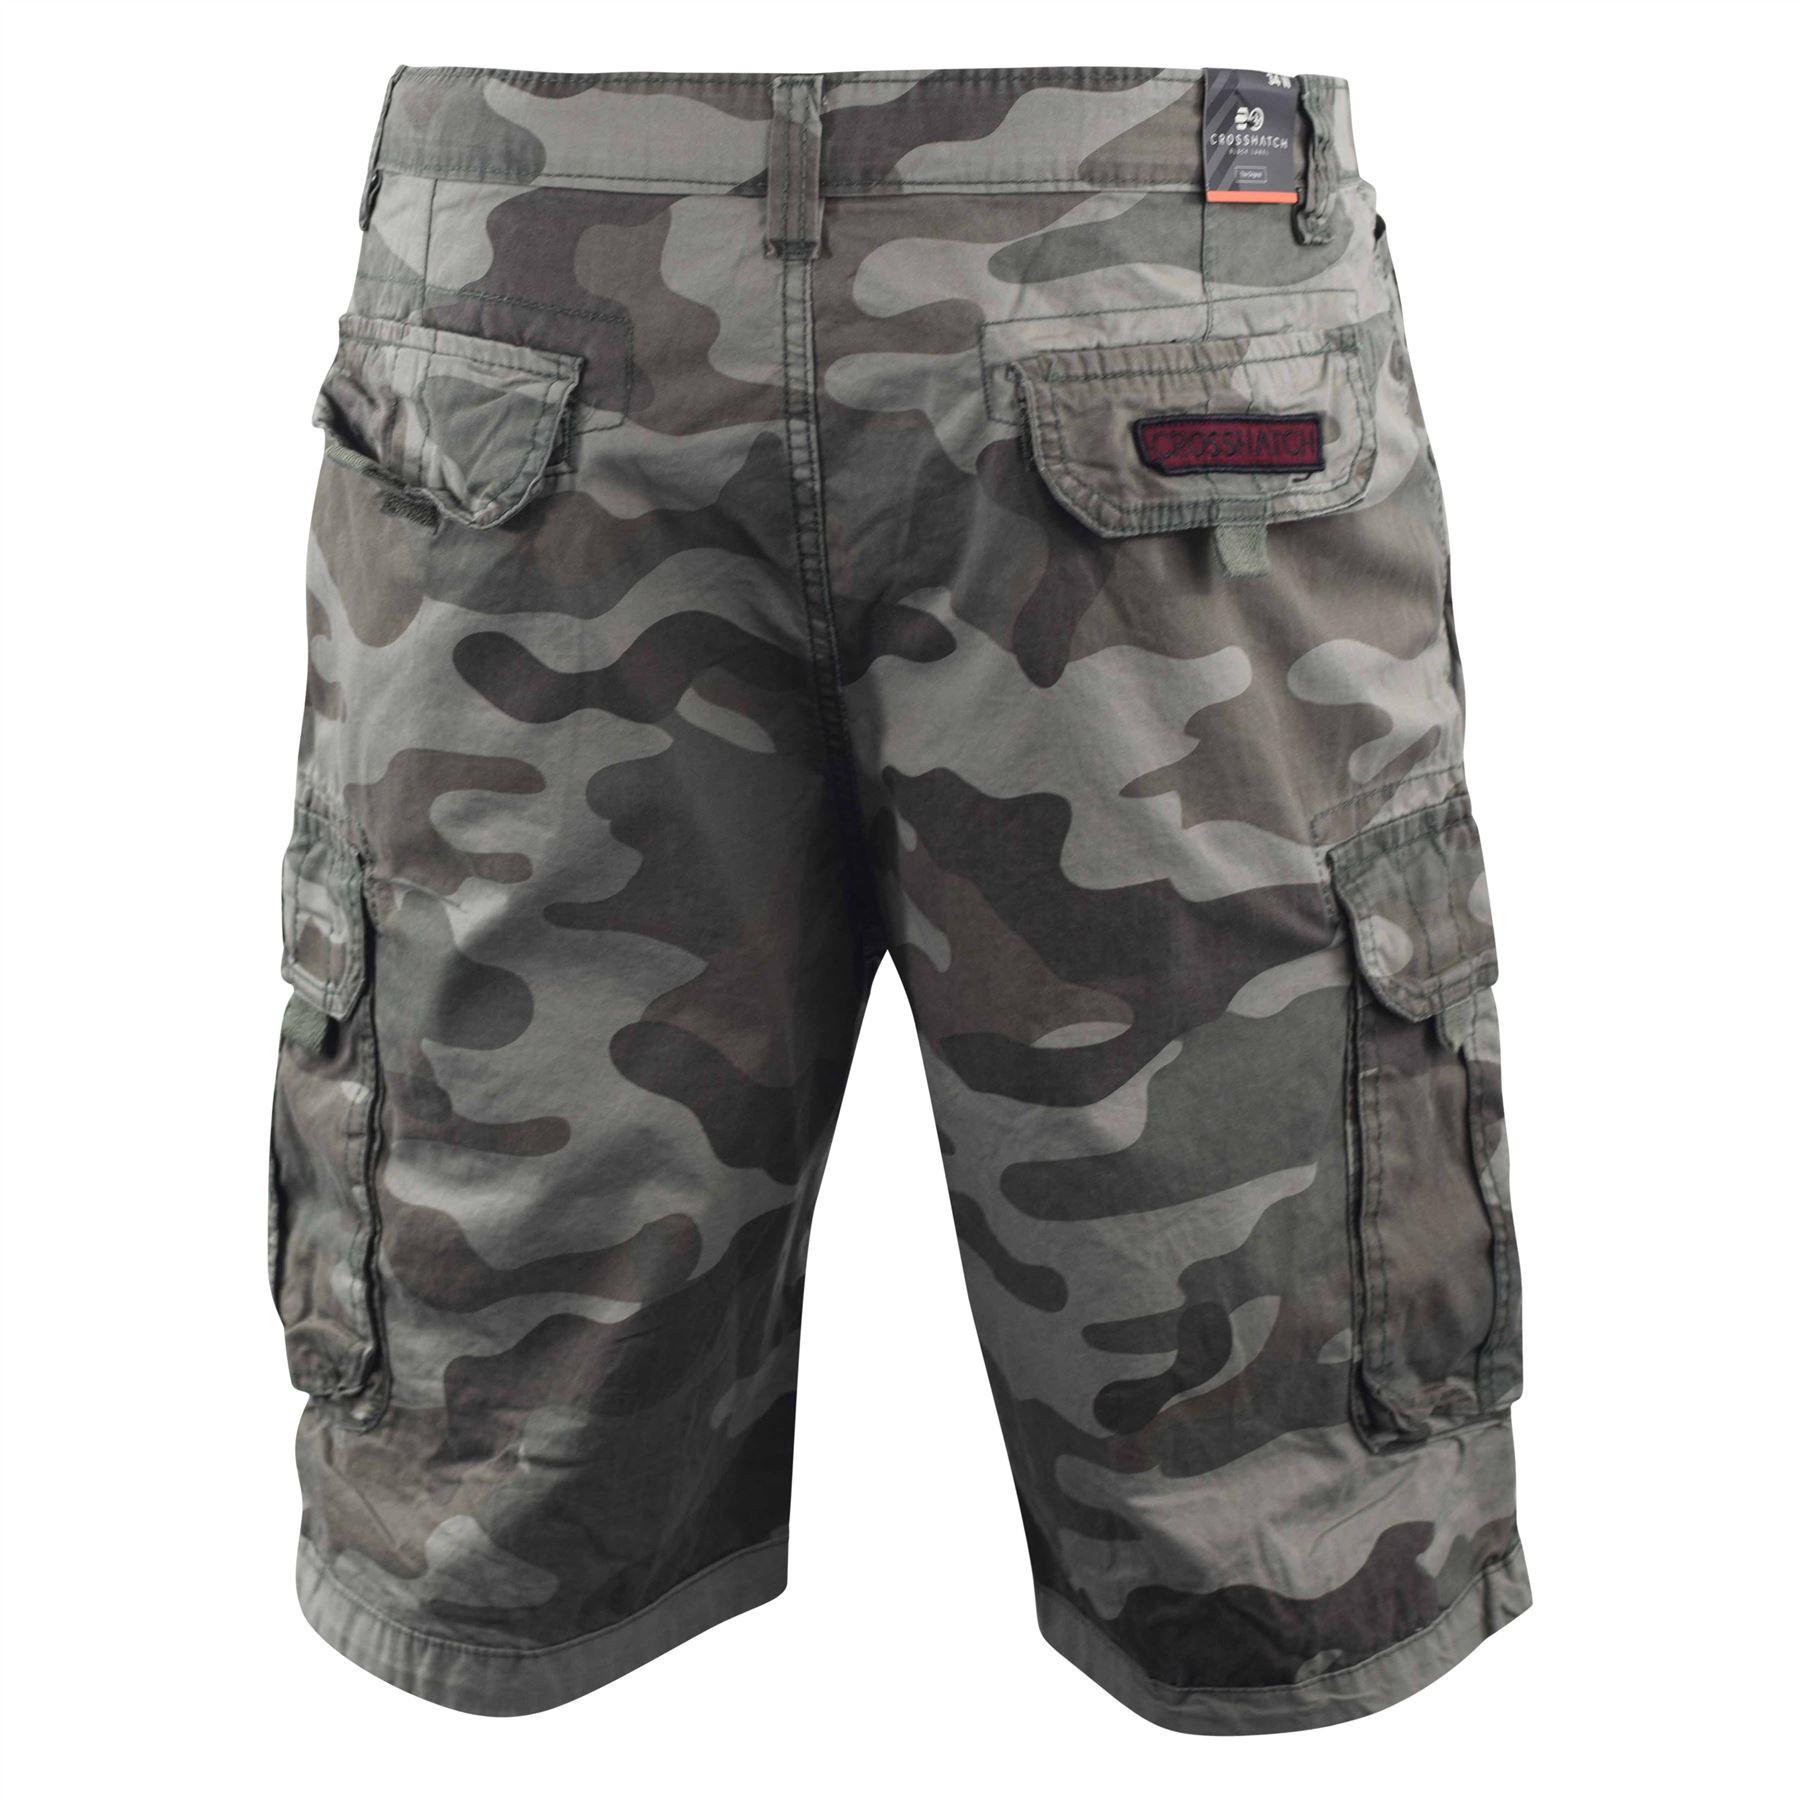 f25cd82841 Mens Crosshatch Chinos Camo Cargo Shorts Jeans Combat 3/4 Knee ...